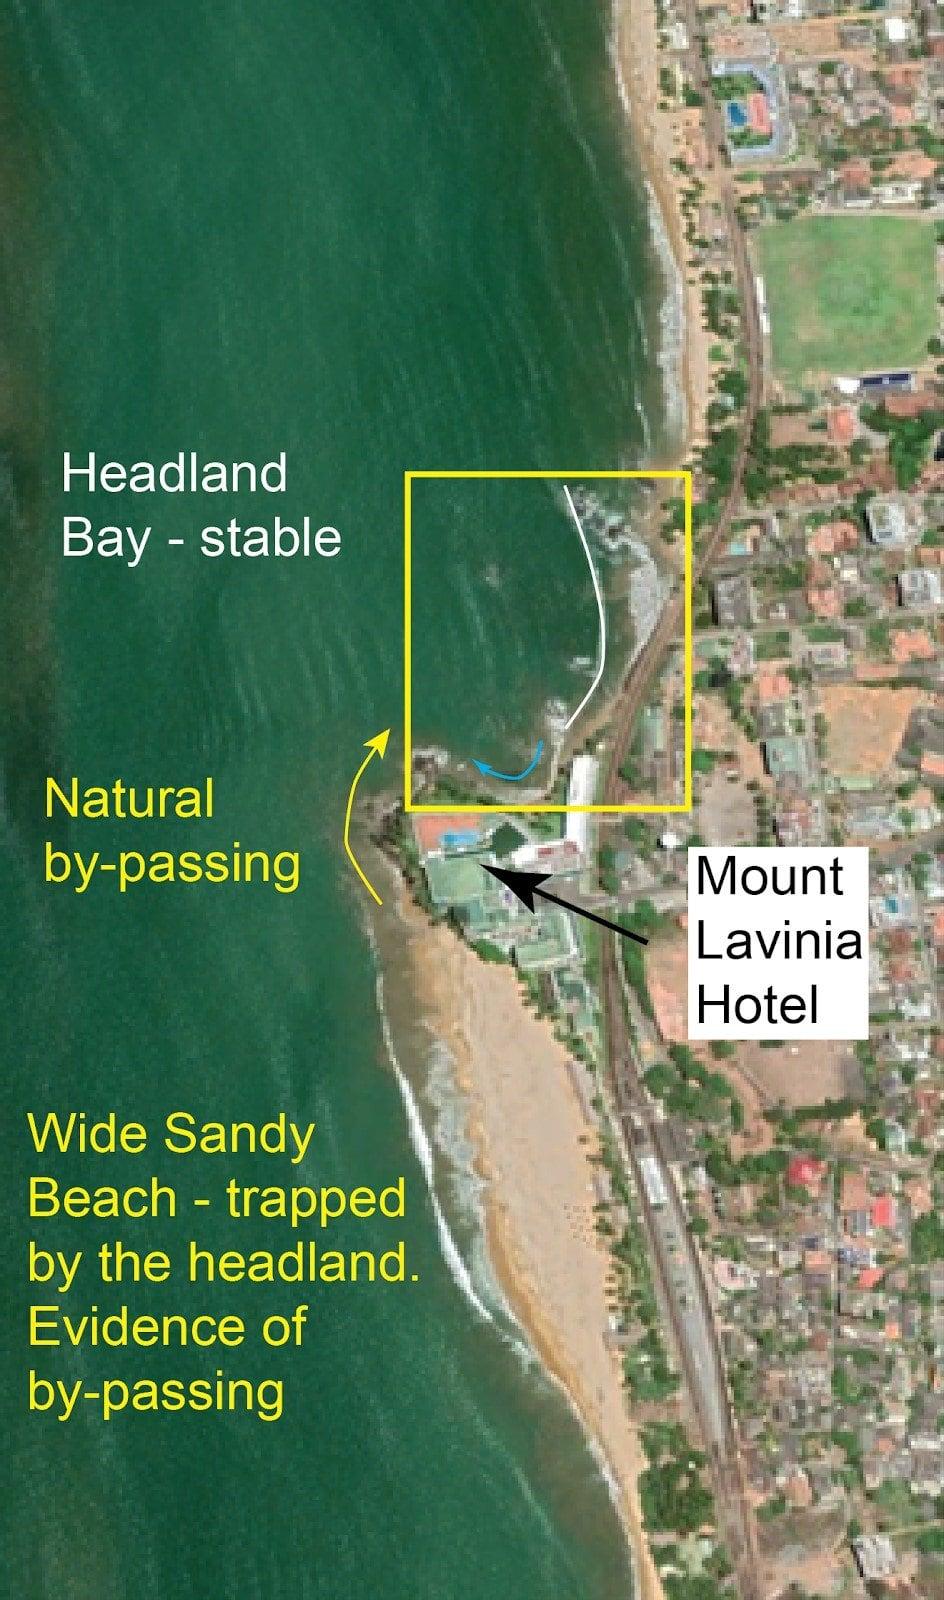 The tragedy of Mount Lavinia beach 1